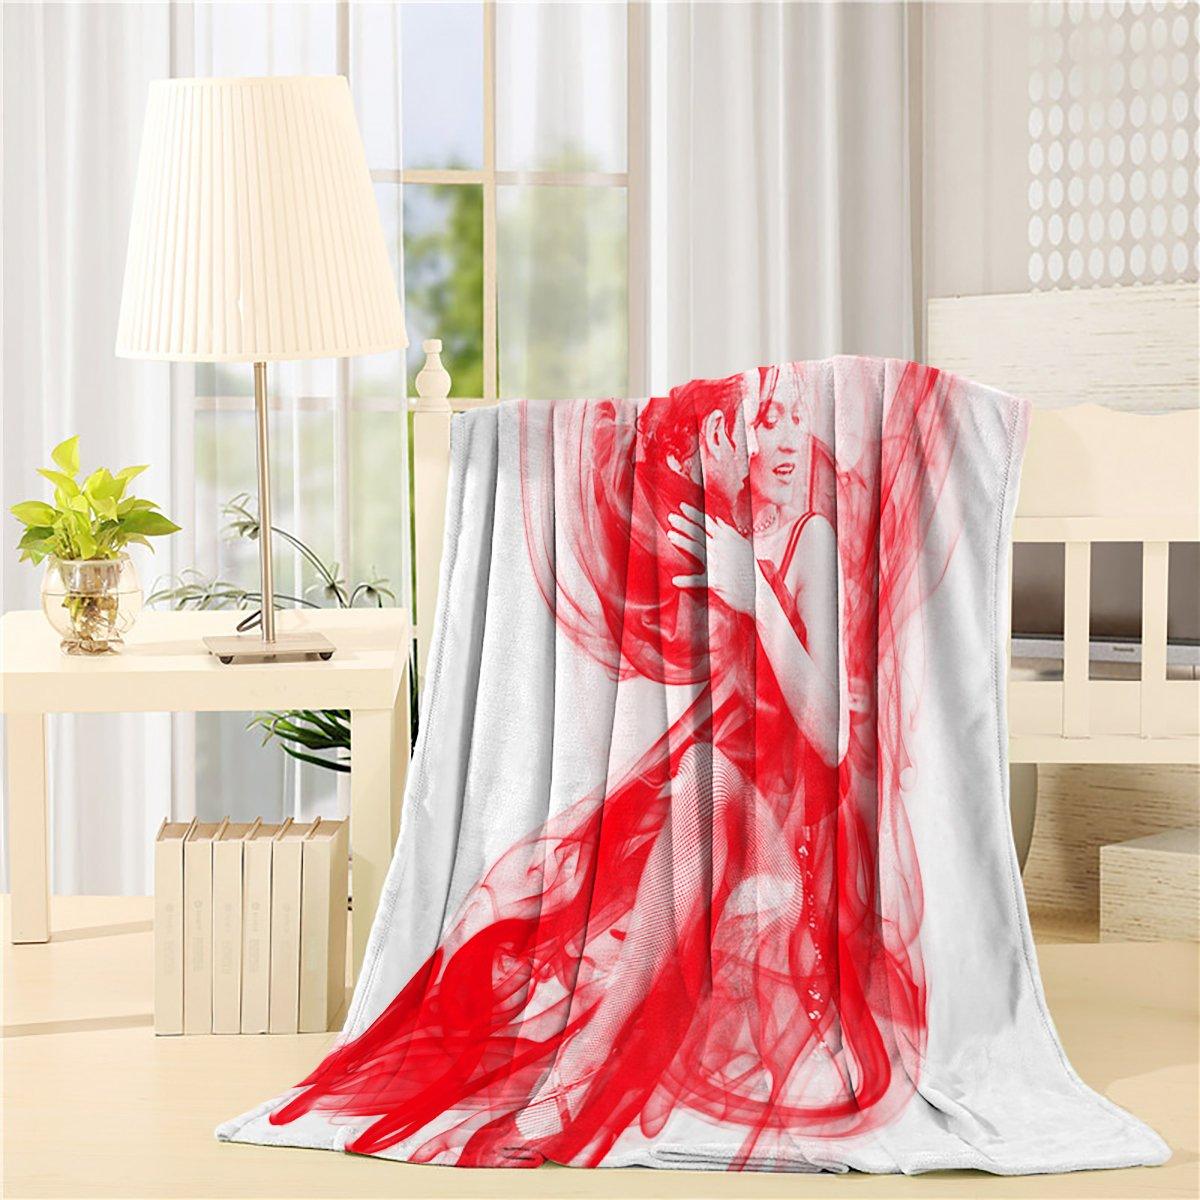 Fleece Blanket Art Illustration of Dance Rhythm Romantic Blankets for Living Room Bedroom Wearing By Teather